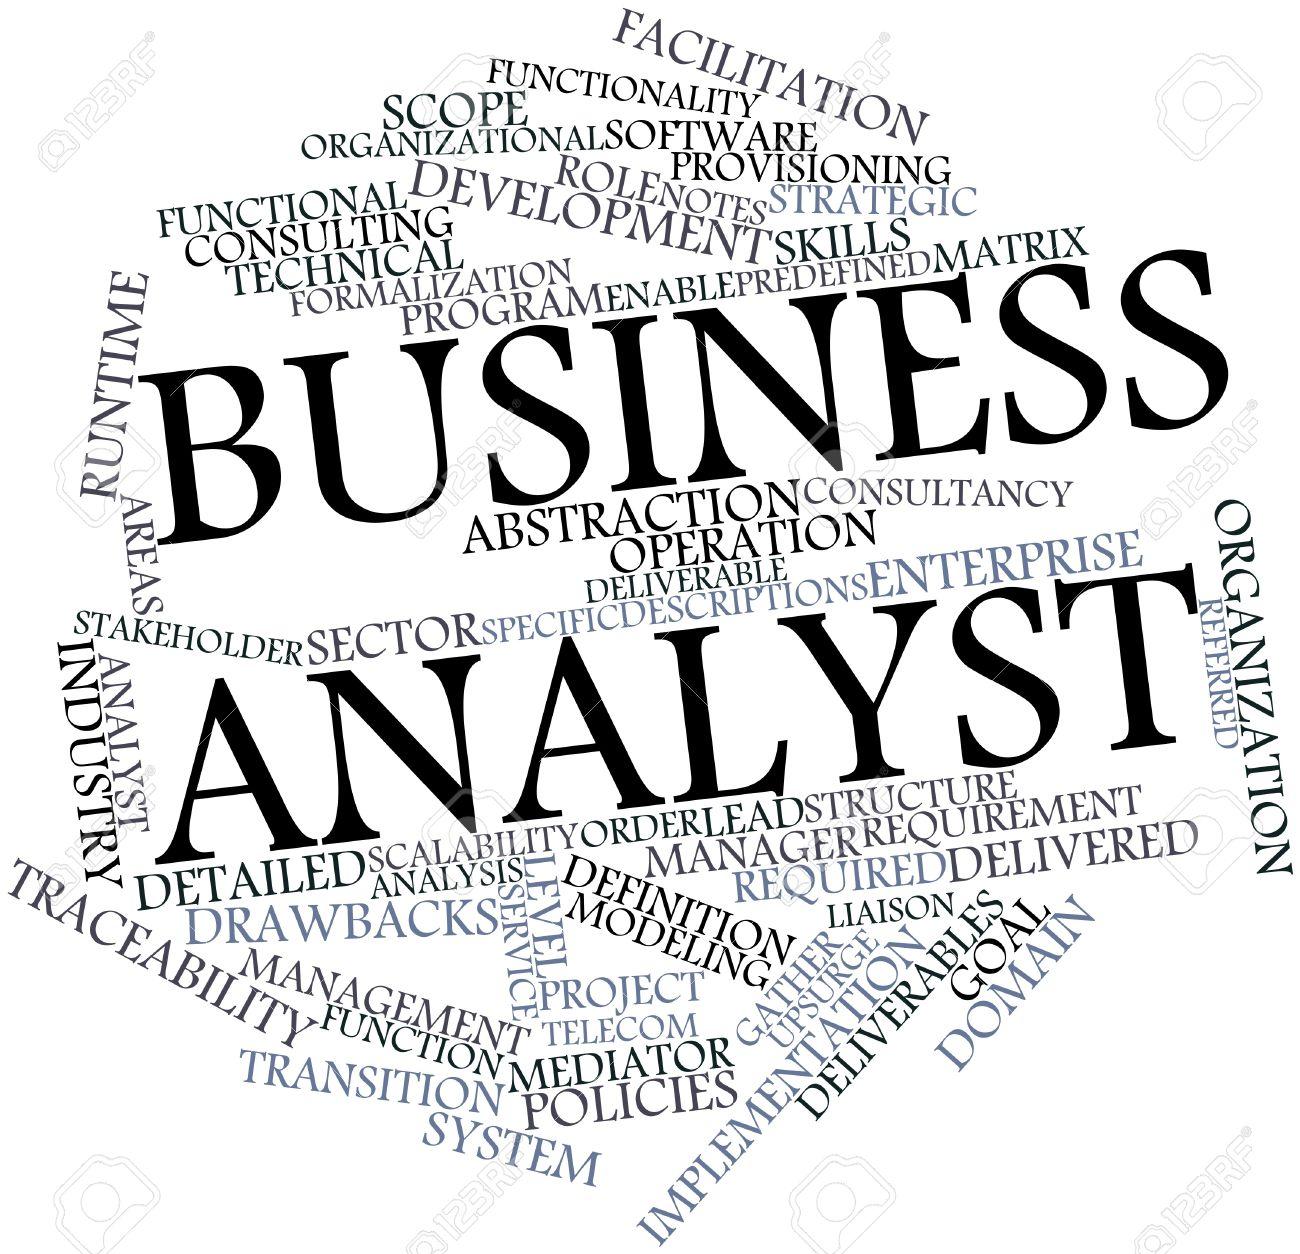 Business Analyst Training